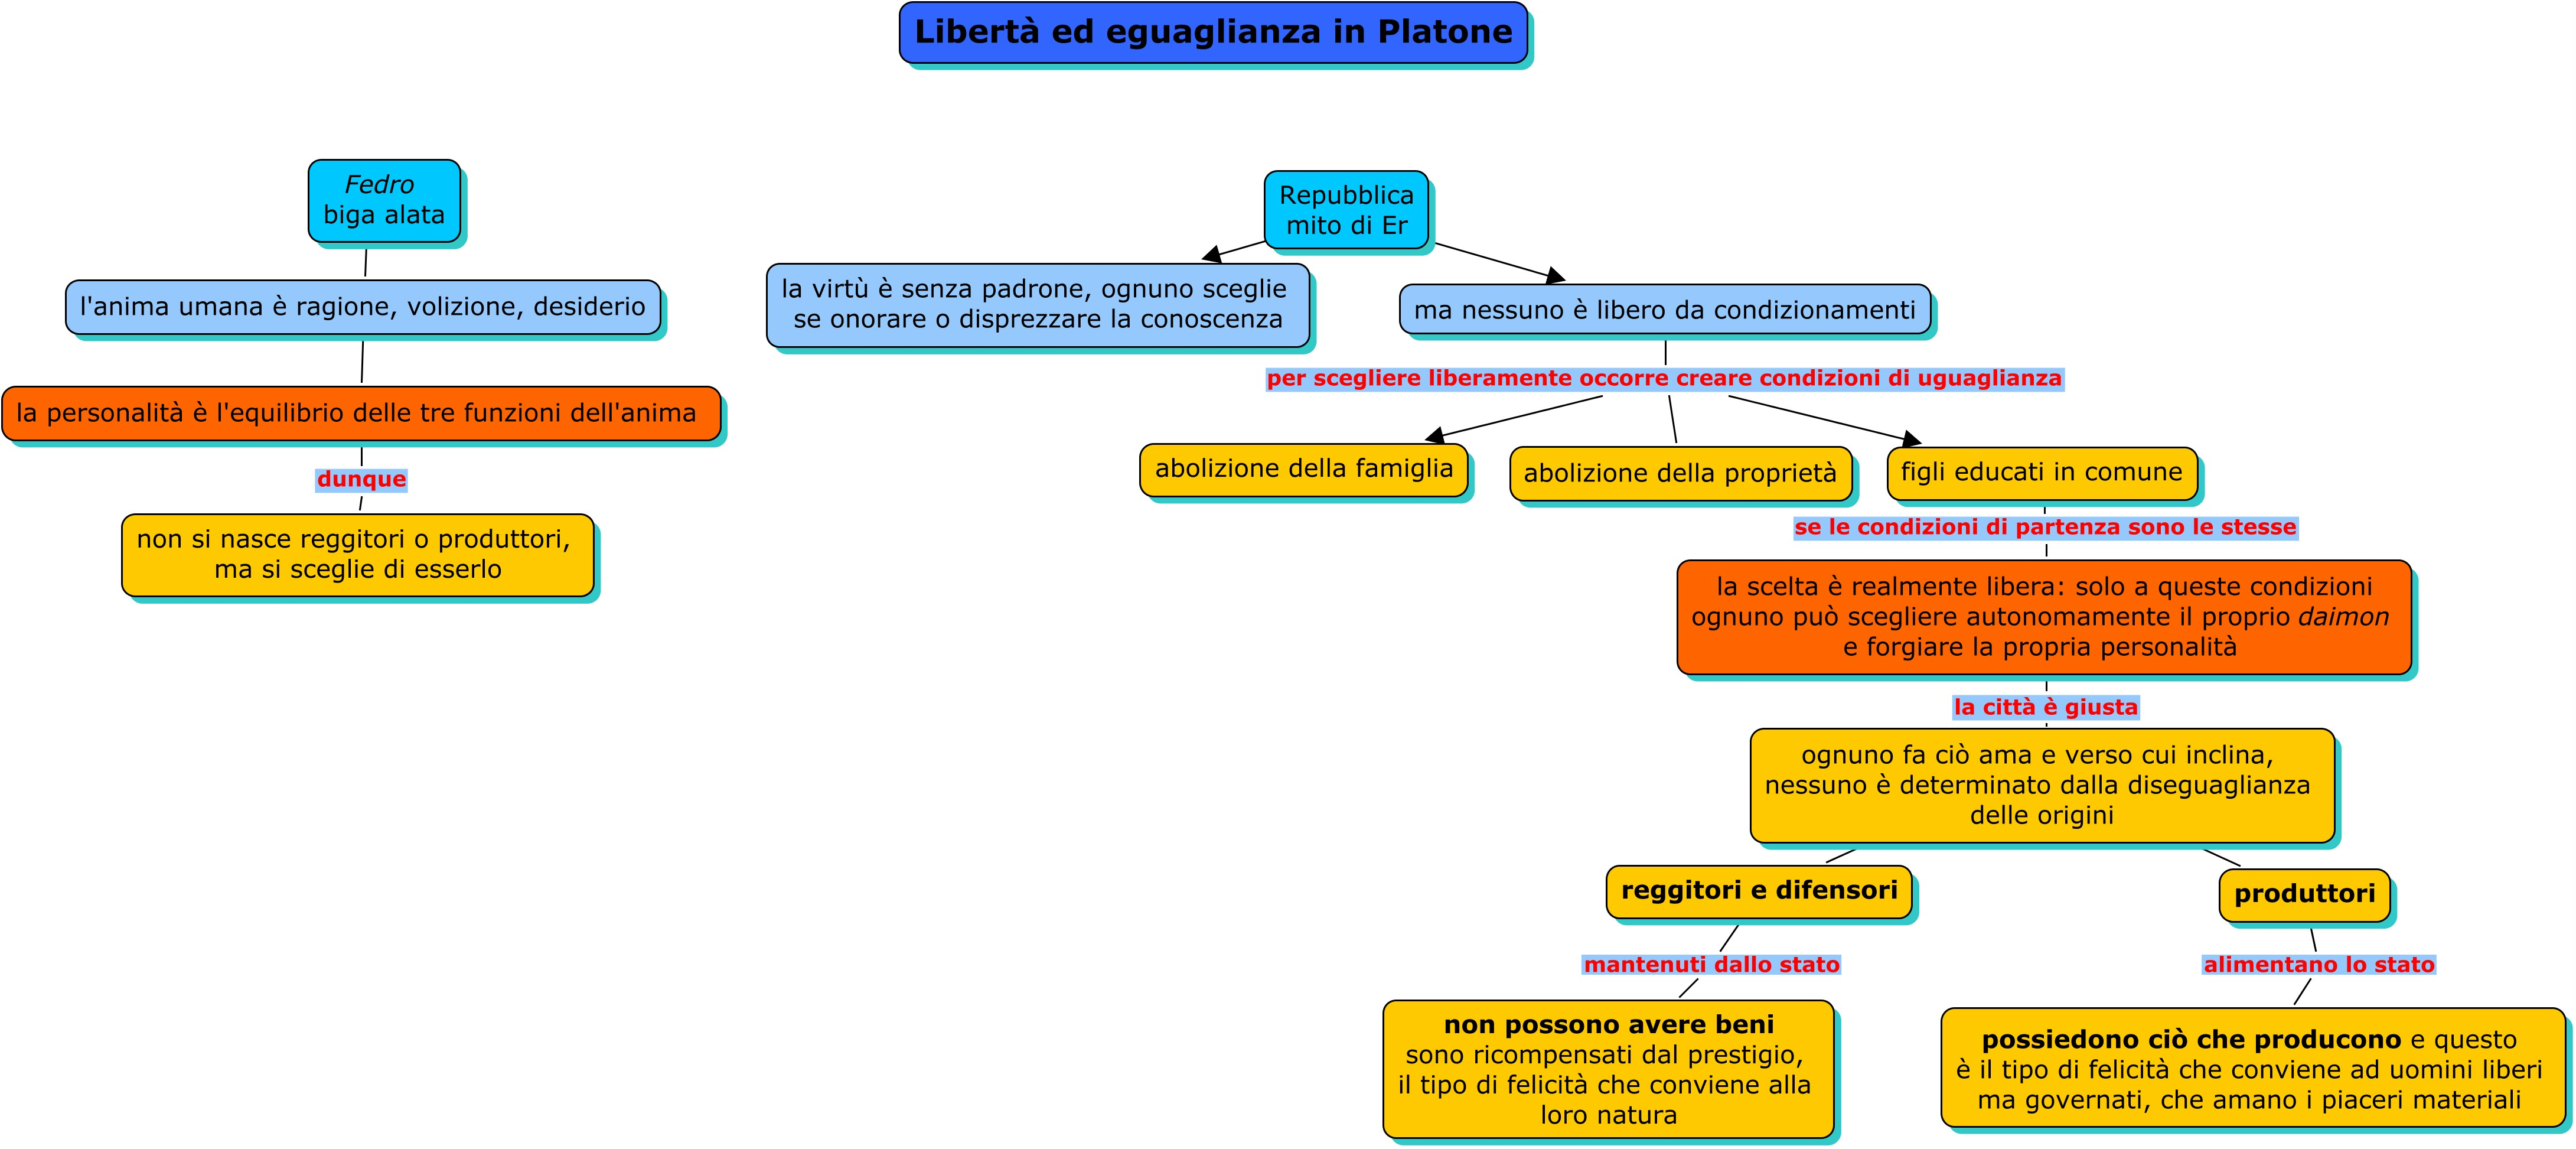 Libertà ed eguaglianza in Platone